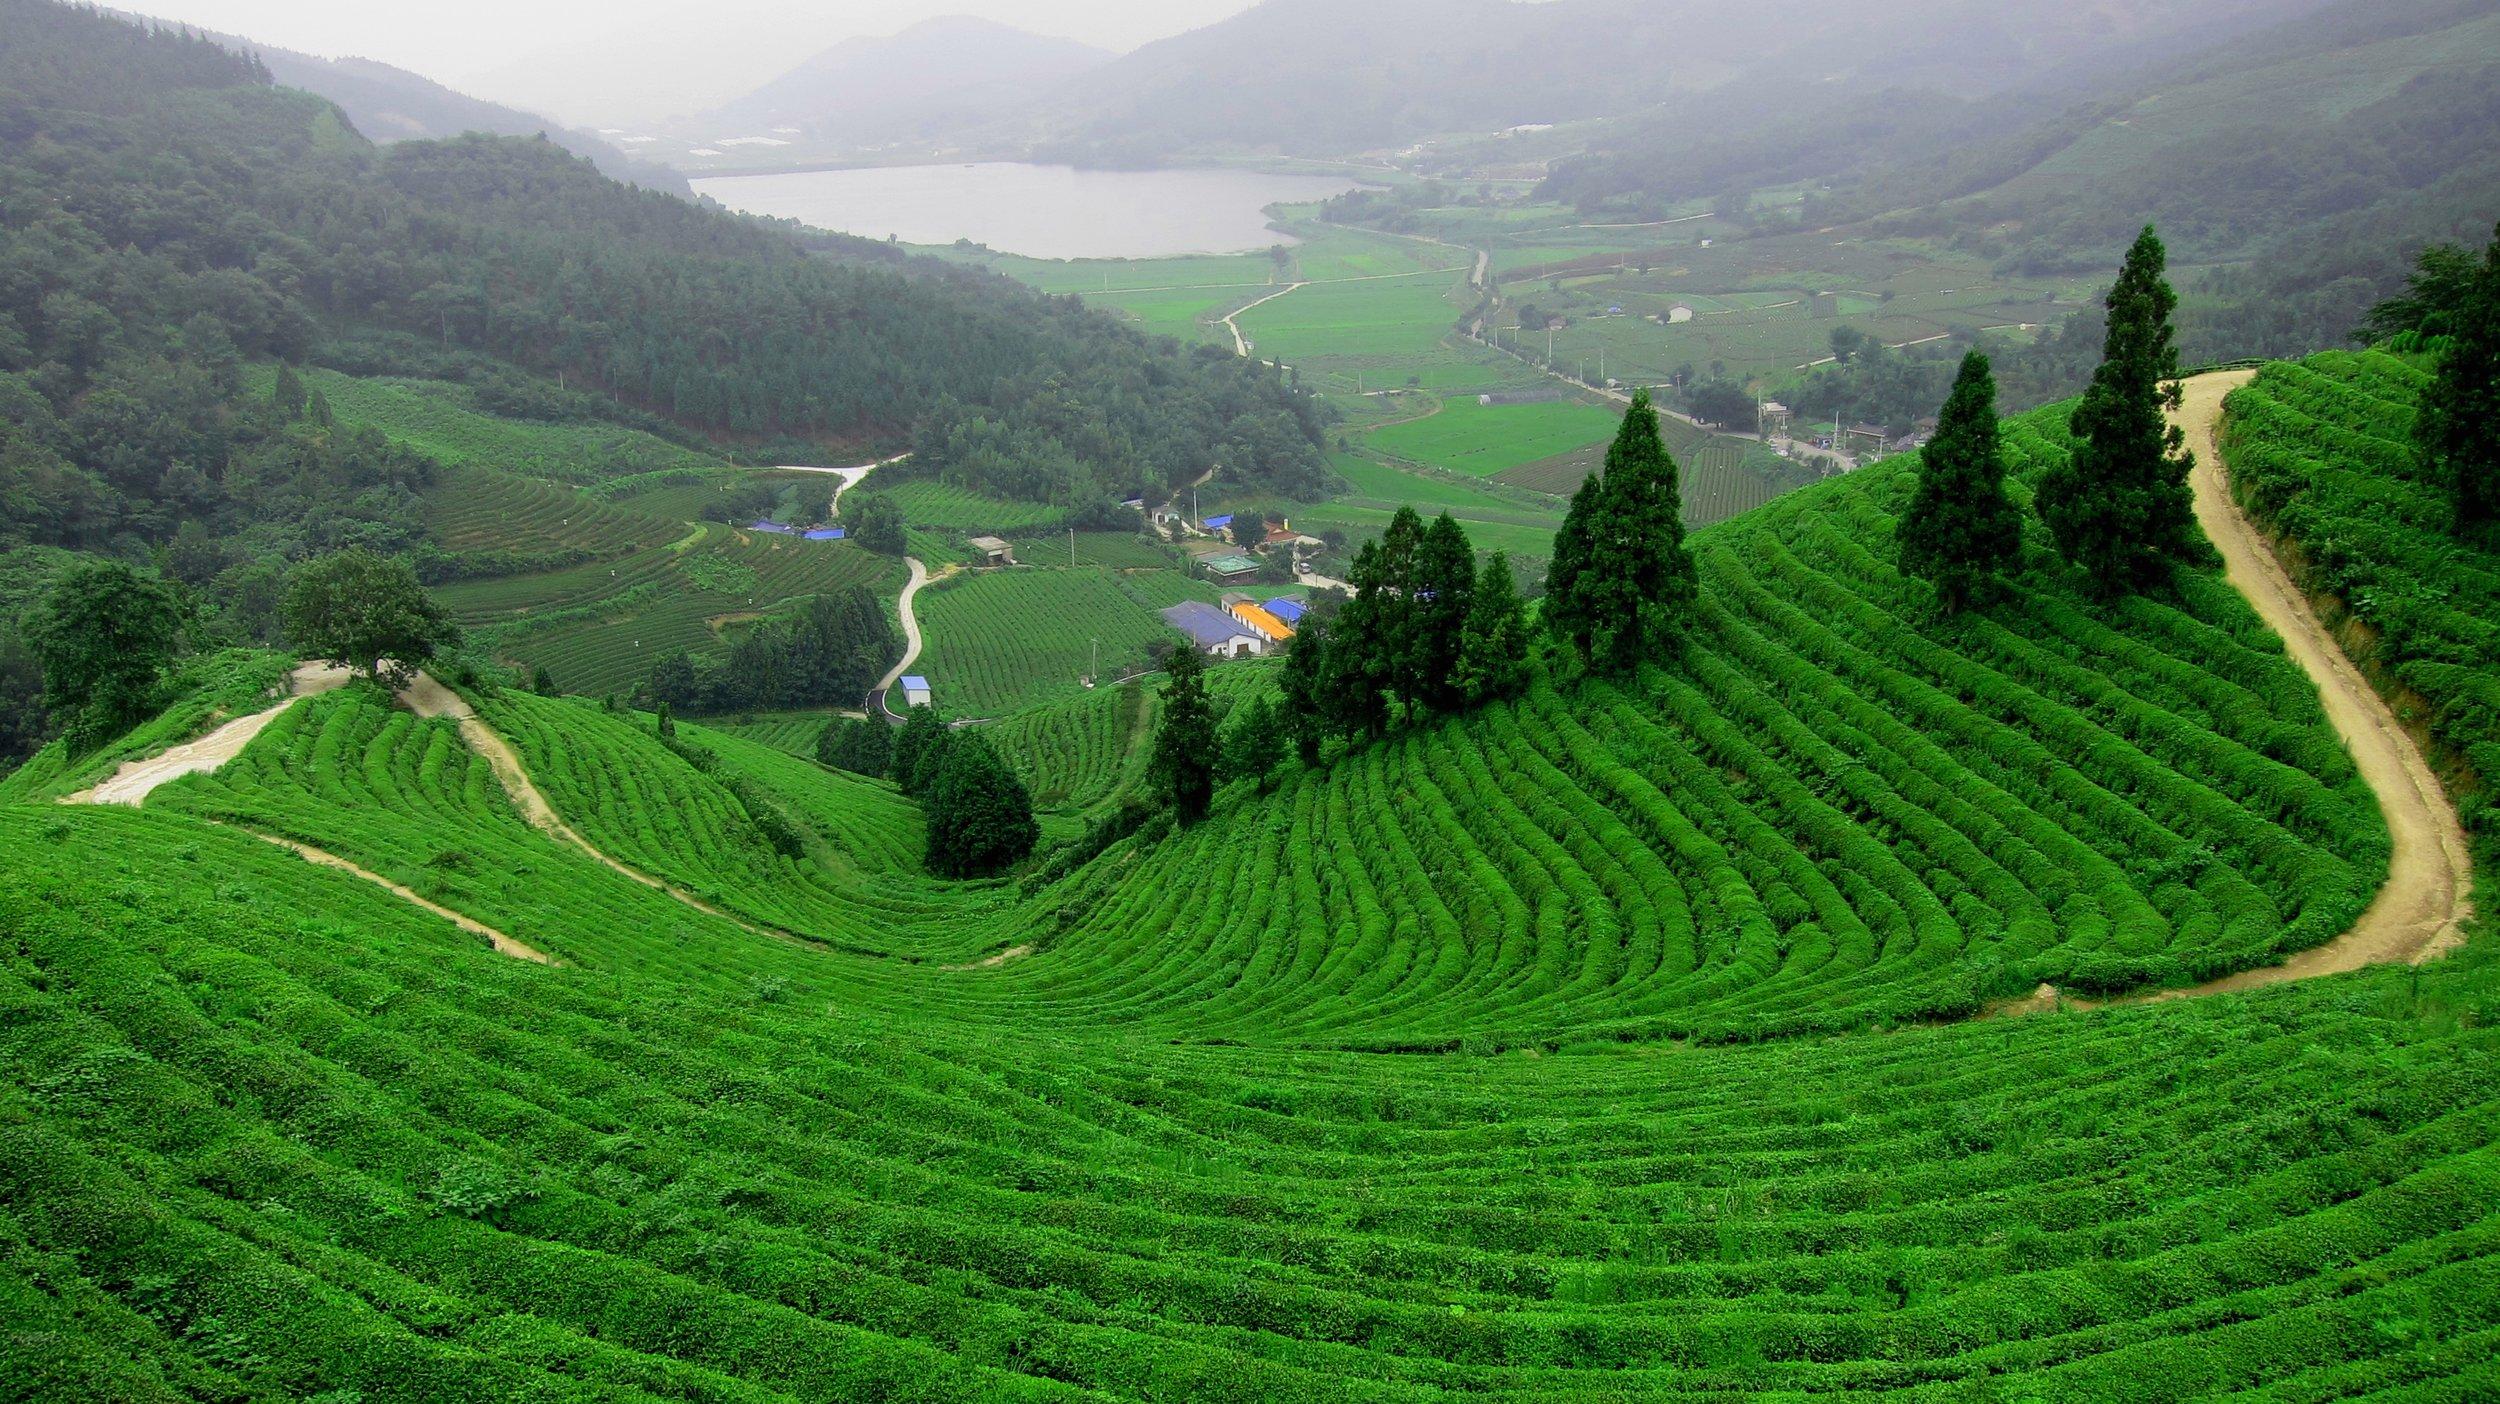 Dragon Well Tea Fields, Zhejiang Province